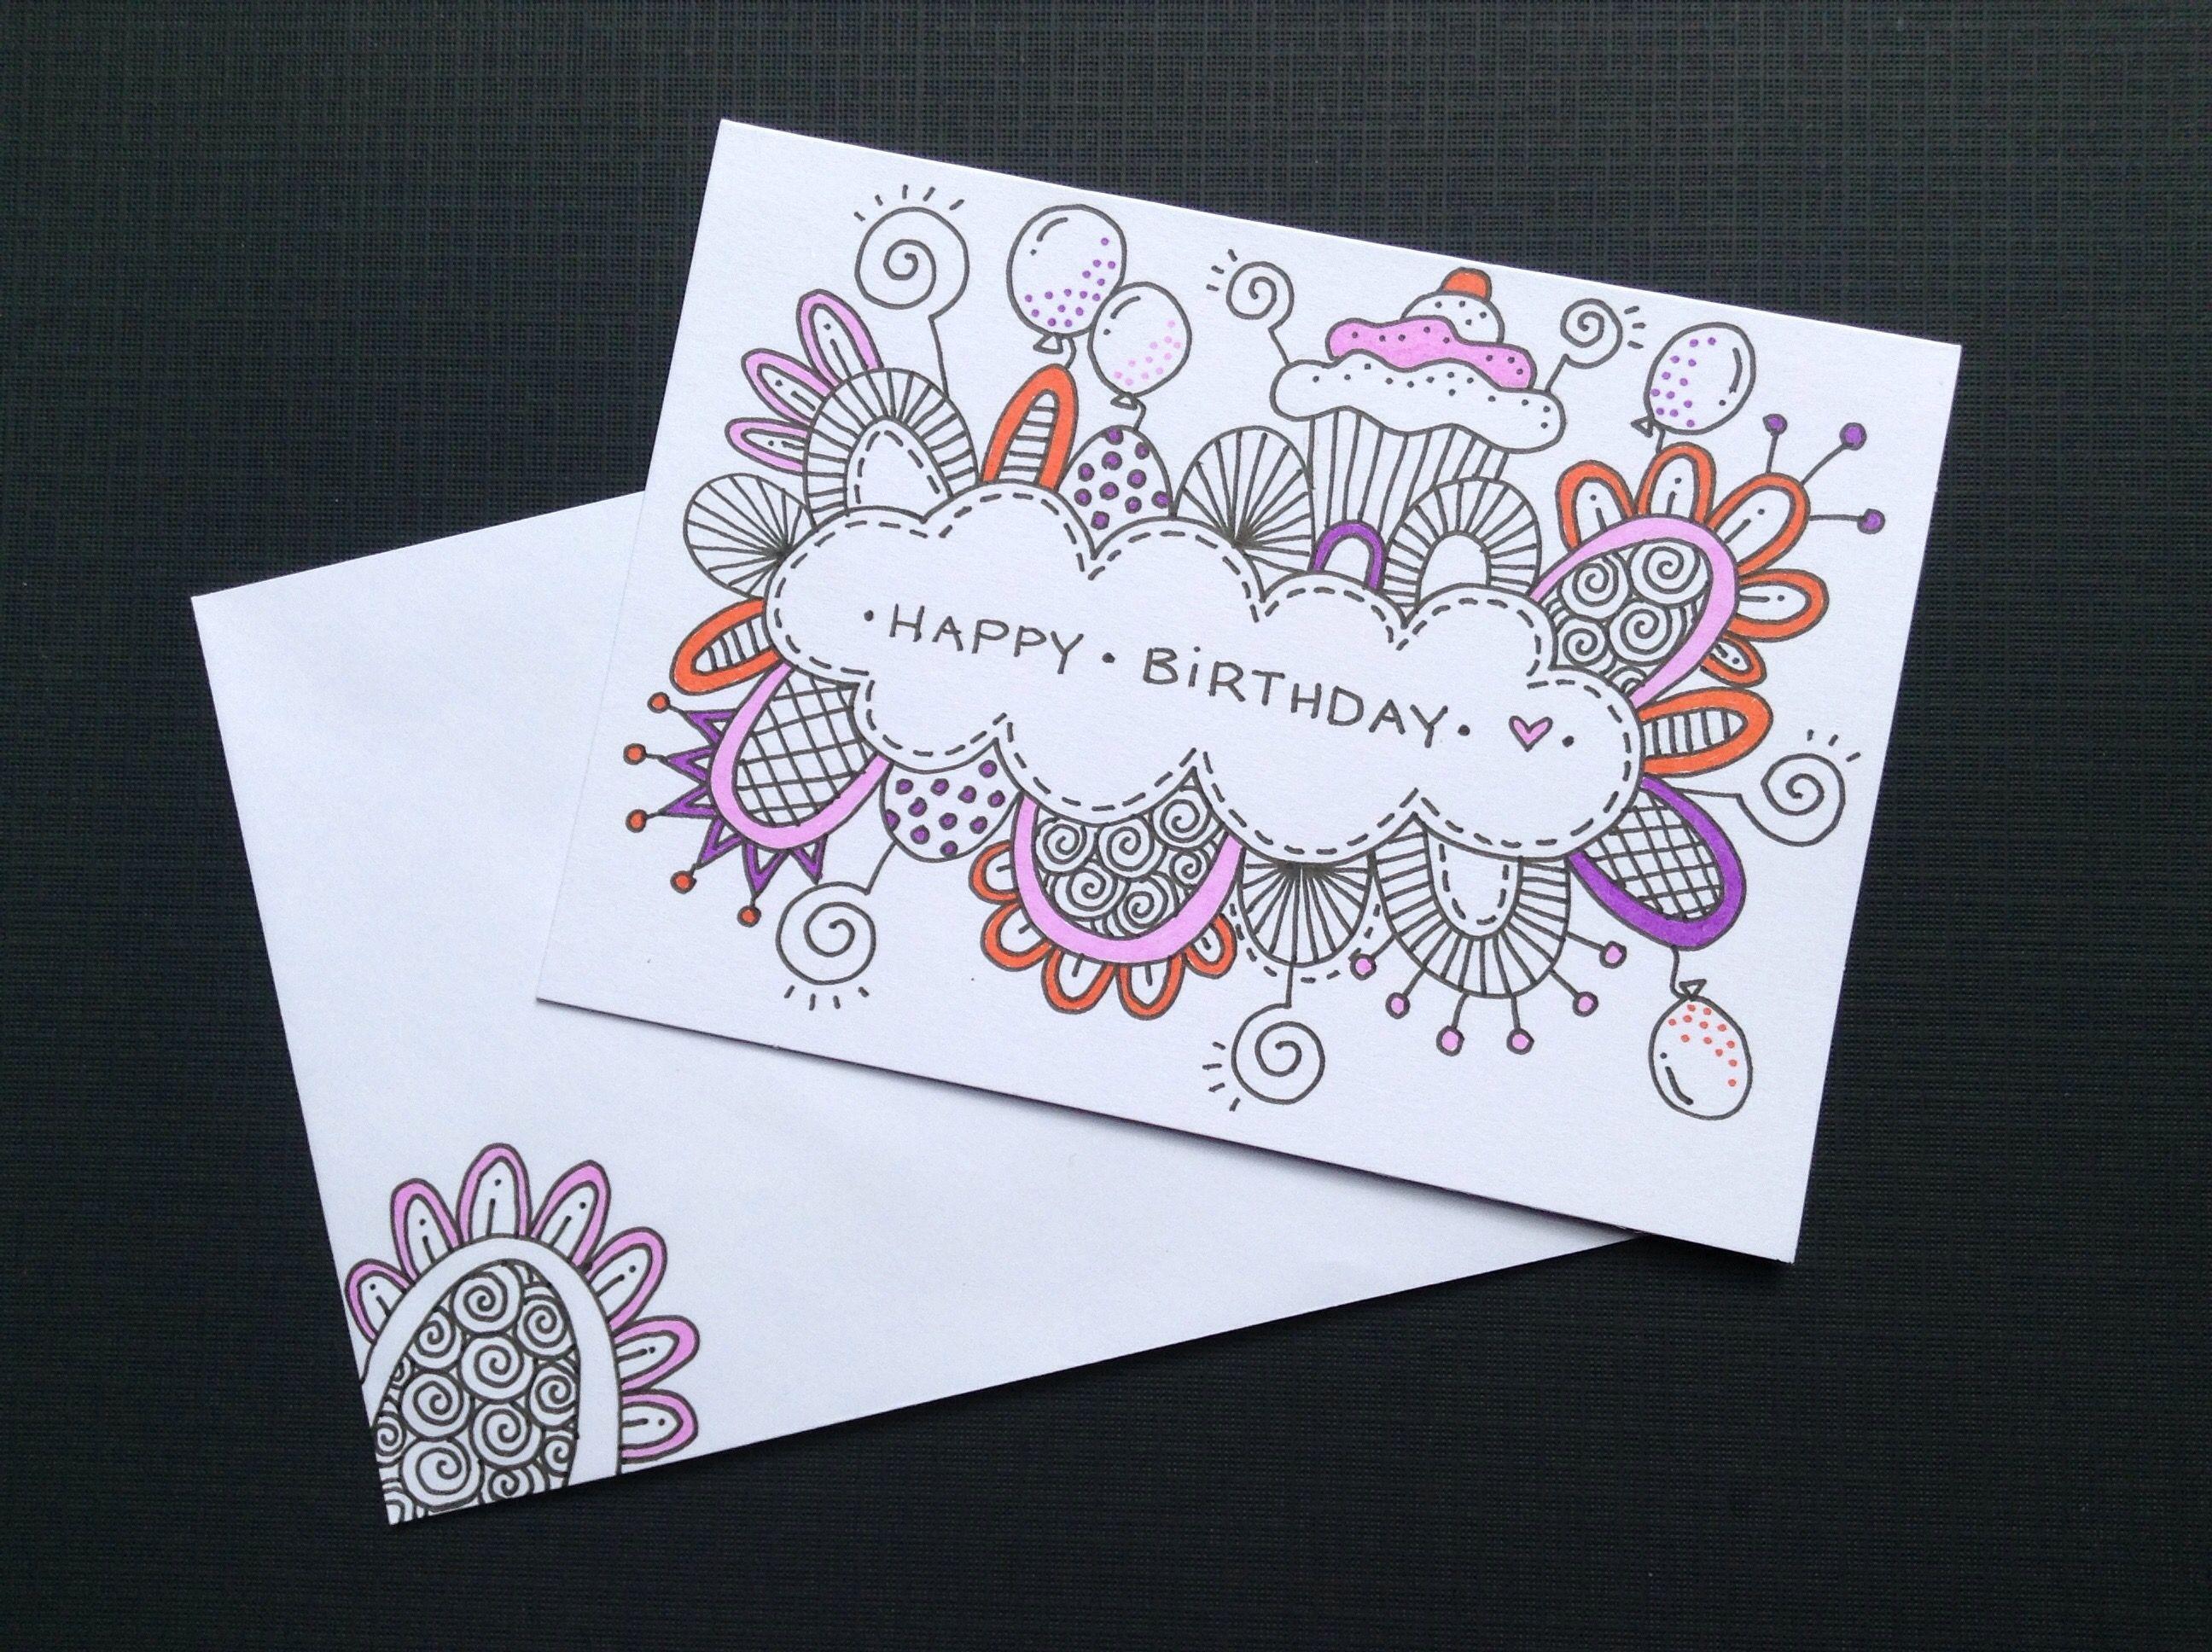 Hand Drawn Birthday Cards Birthday card drawing, Card